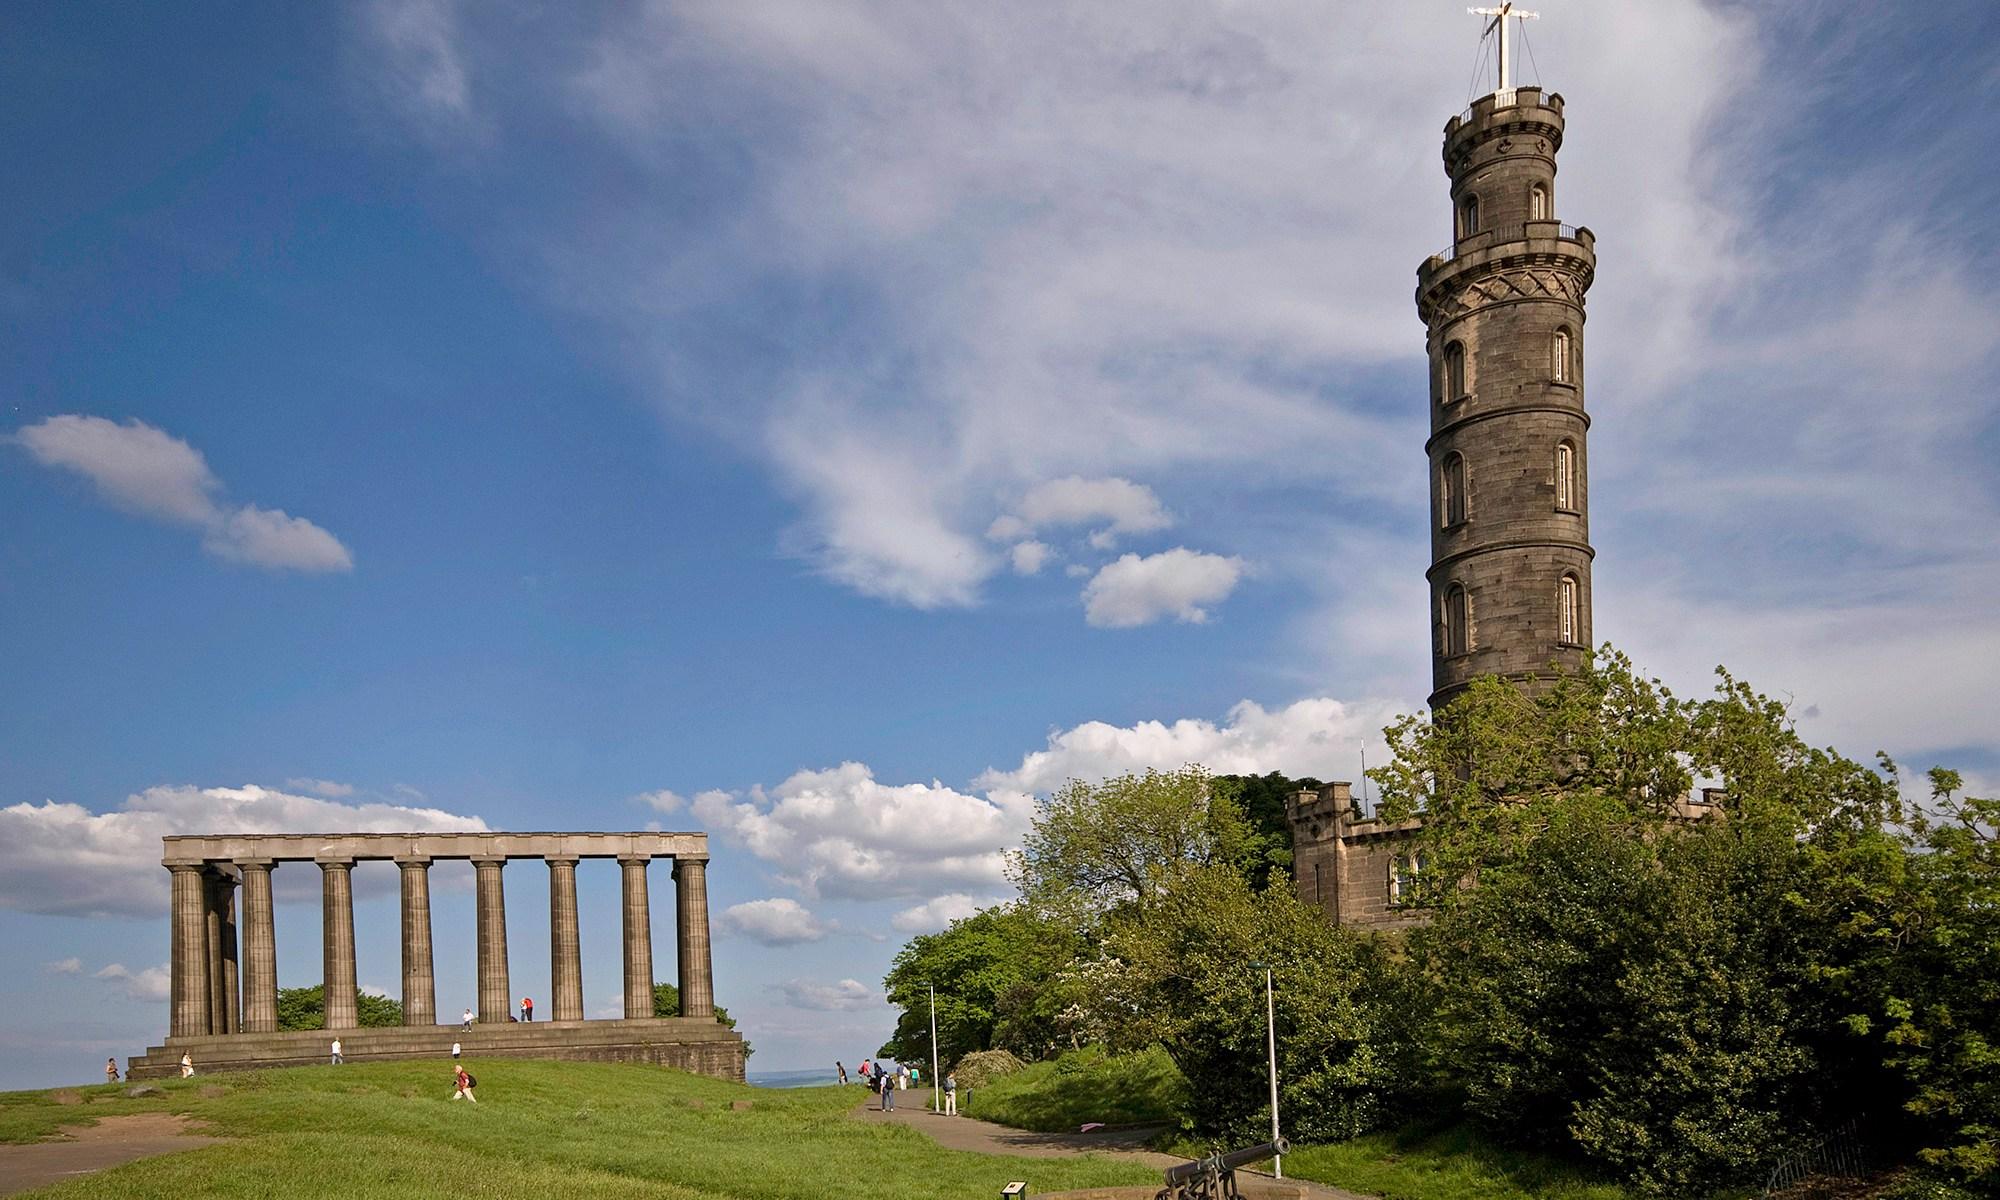 Edinburgh Monument and Nelson's Monument